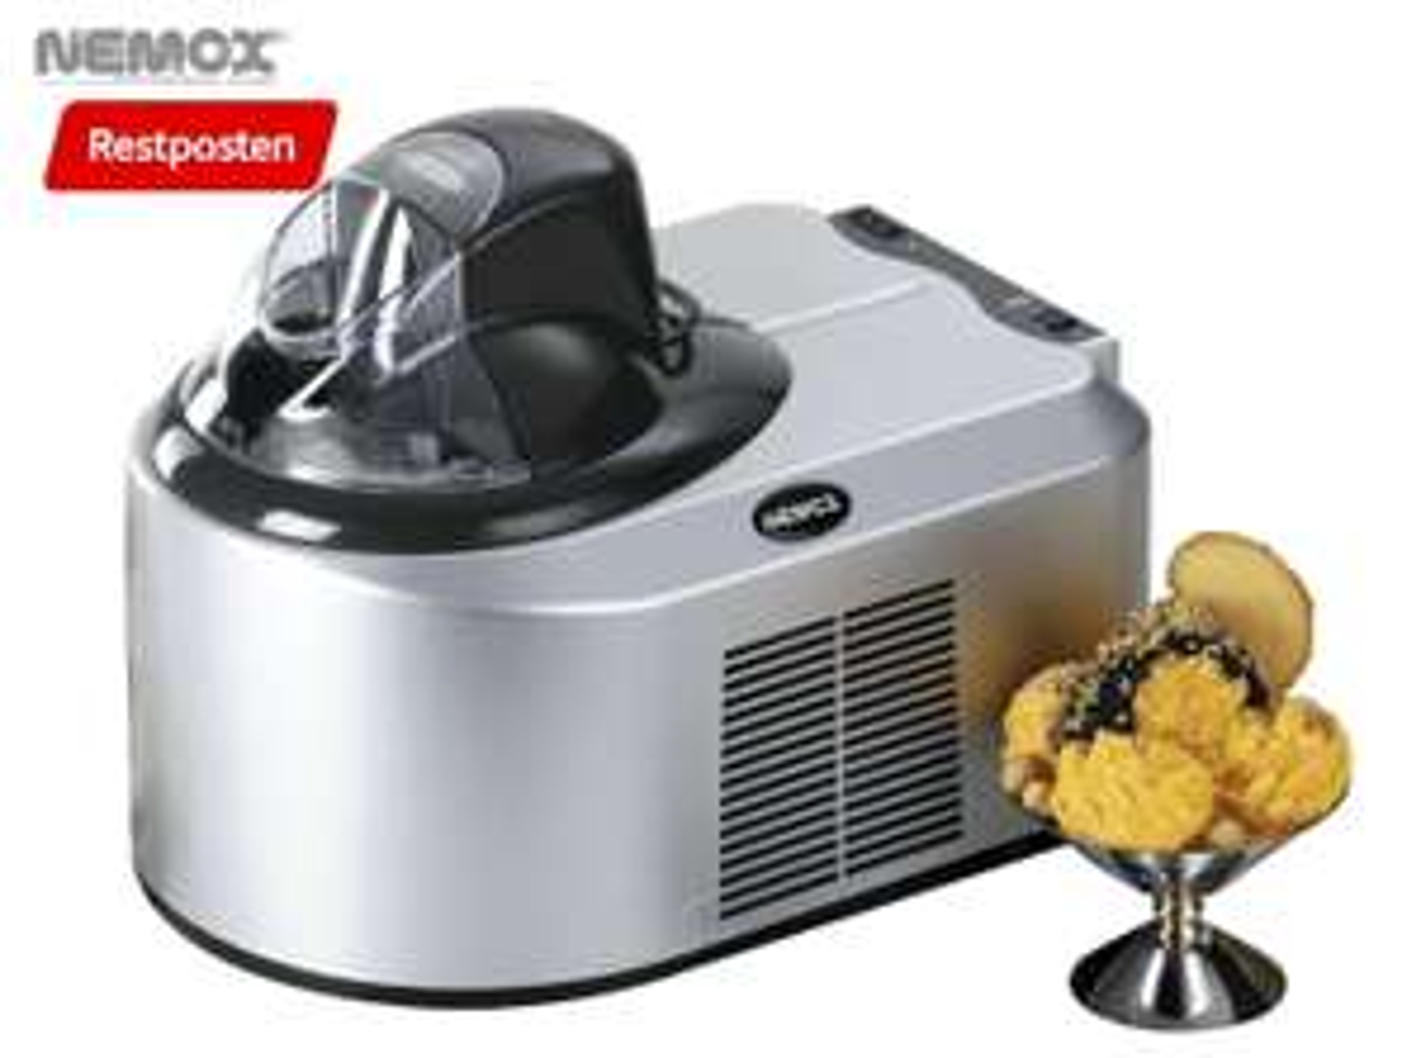 NEMOX Gelato Oxiria Eismaschine (150 Watt, silber)